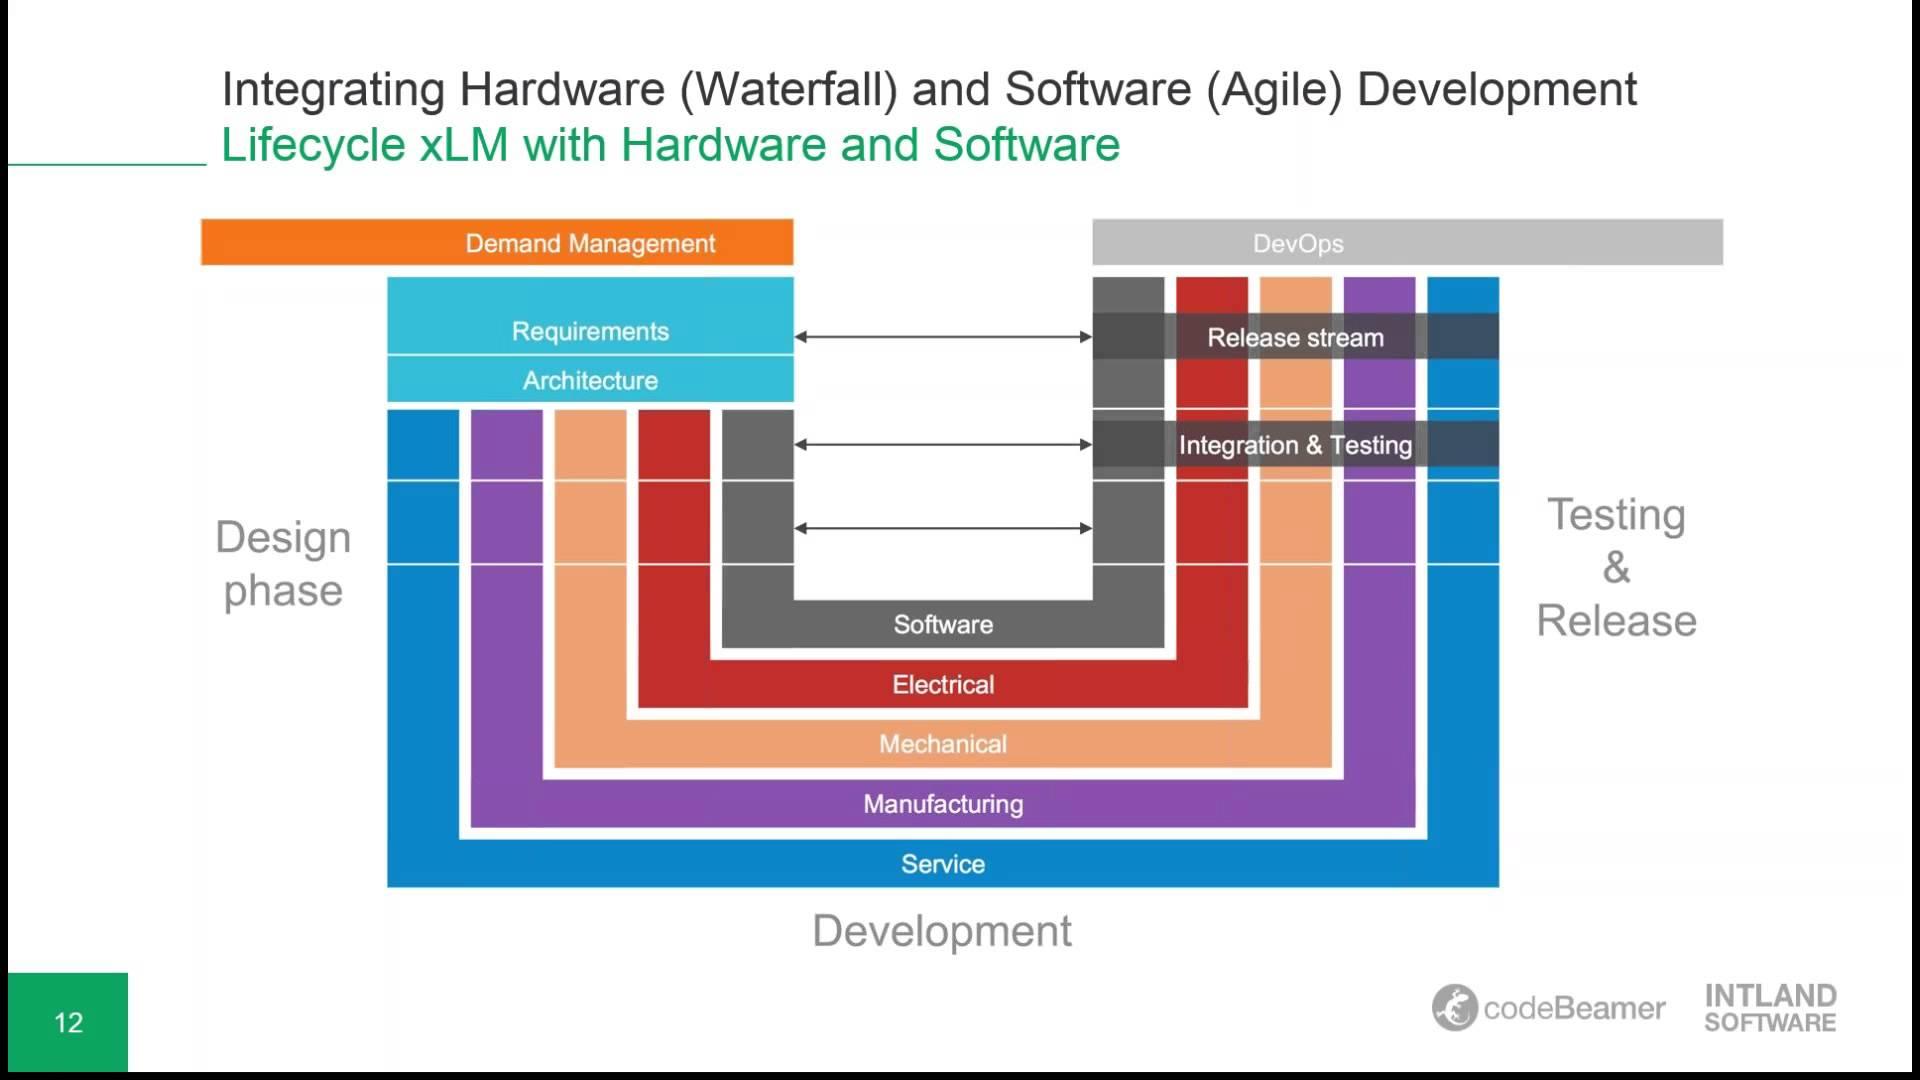 Webinars & Events | codeBeamer ALM | Intland Software